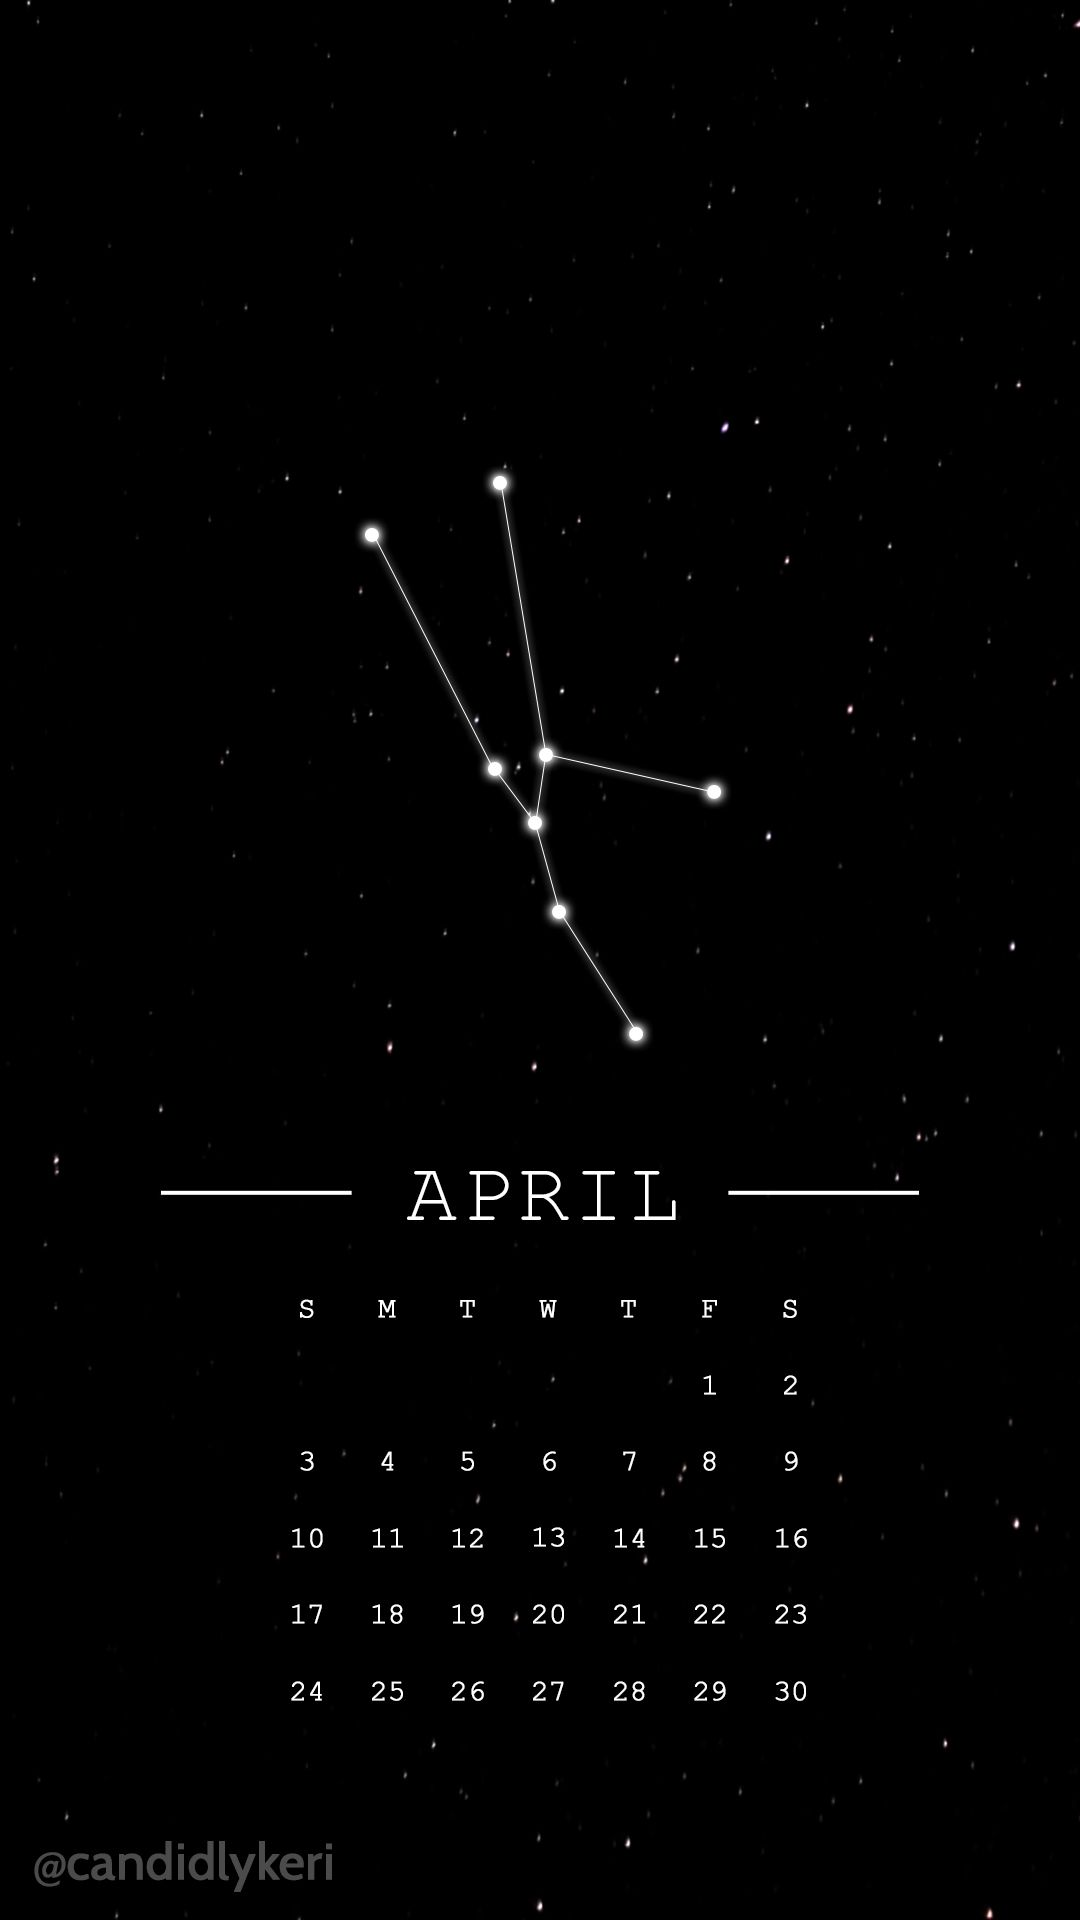 Taurus Horoscope Constellation For April 2016 Calendar